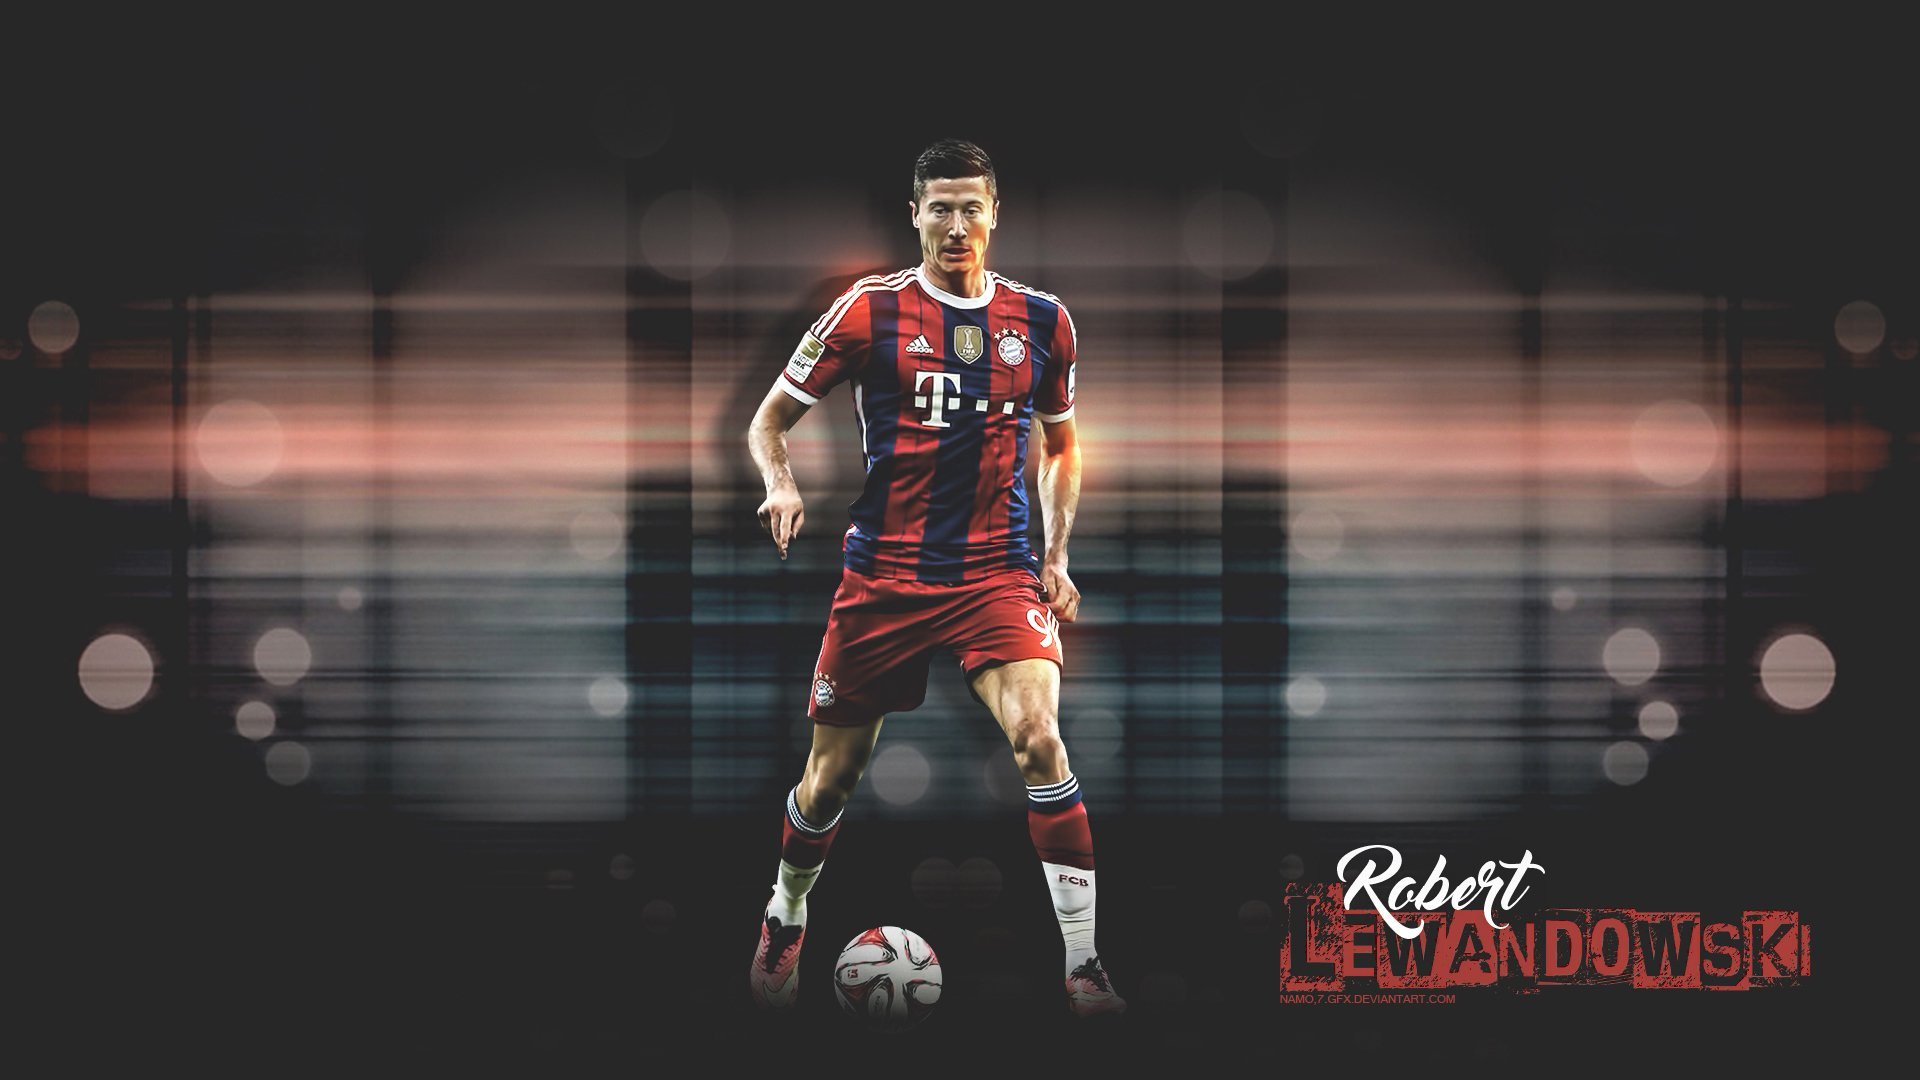 Robert Lewandowski Bayern Hd Wallpaper Hintergrund